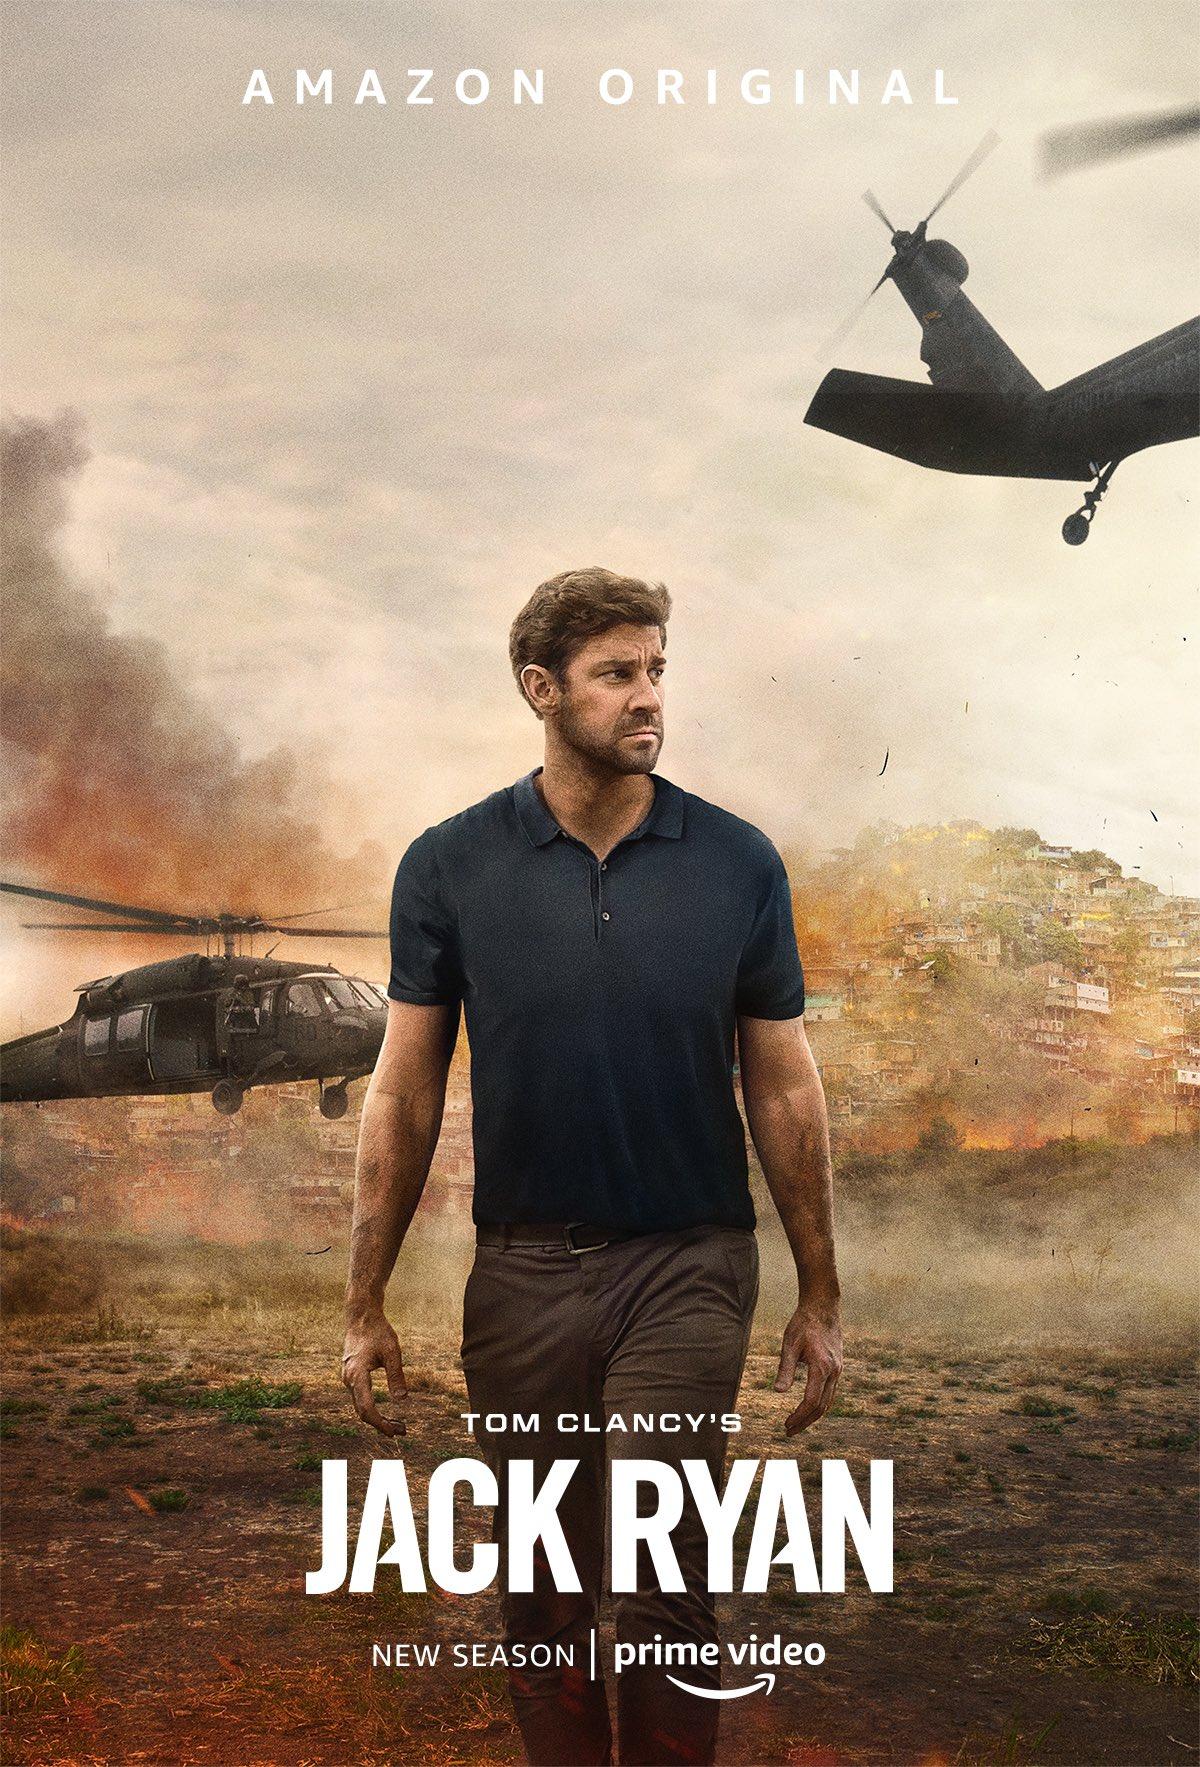 Jack Ryan S02 (2019) Hindi Dual Audio Complete 480p HDRip 1.1GB